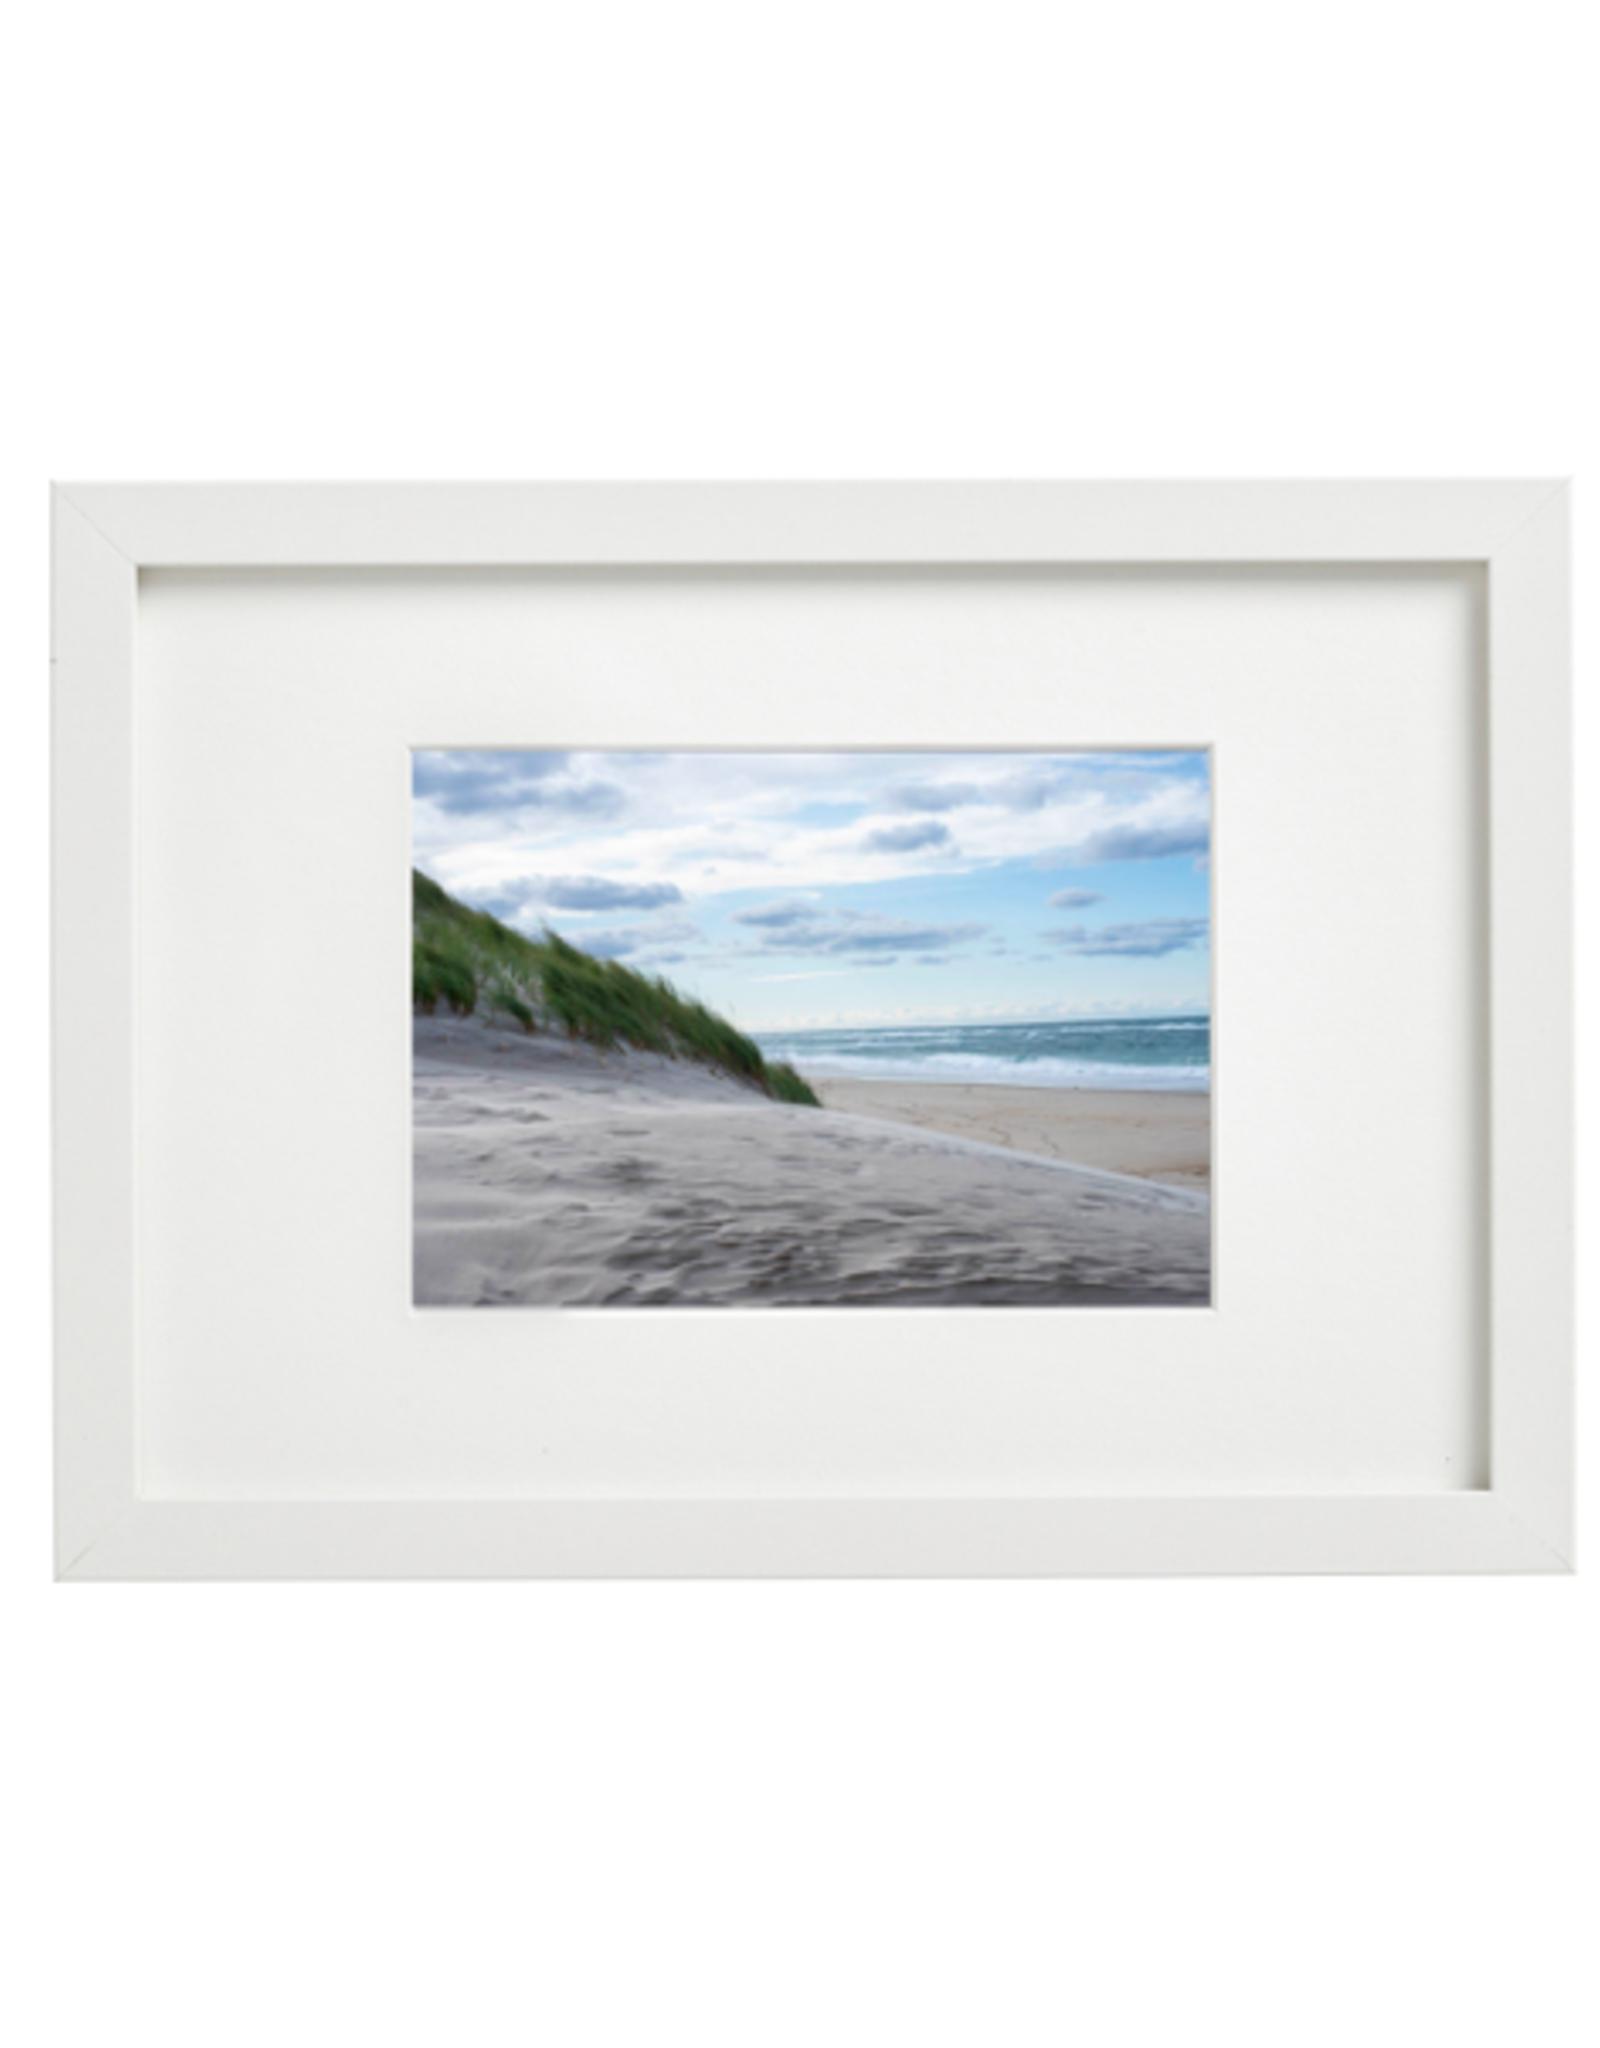 "Aleyah Solomon - Photo Print/North Sable Island 11 x 14"""